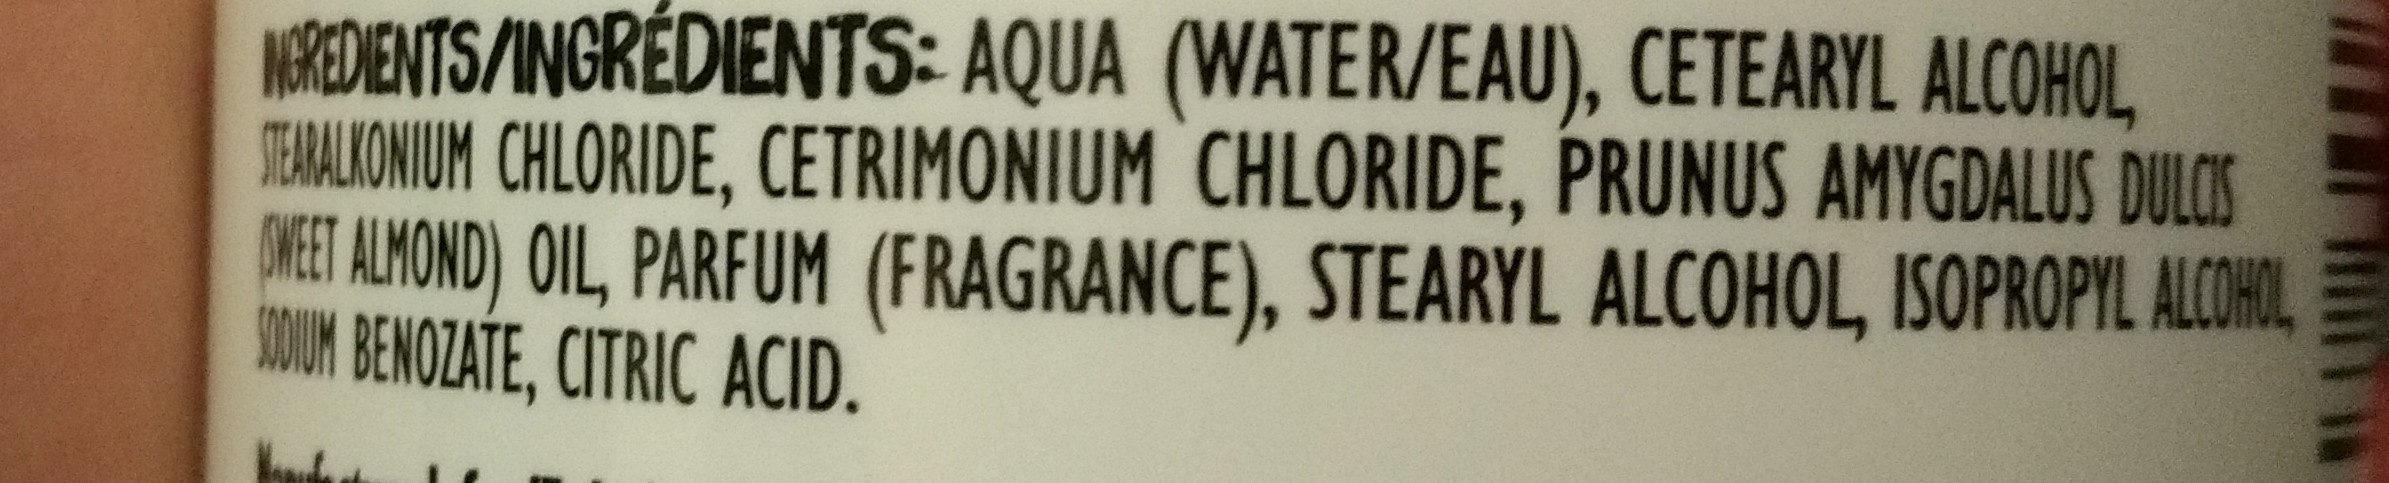 Nourish Me Almond Conditioner - Ingredients - en